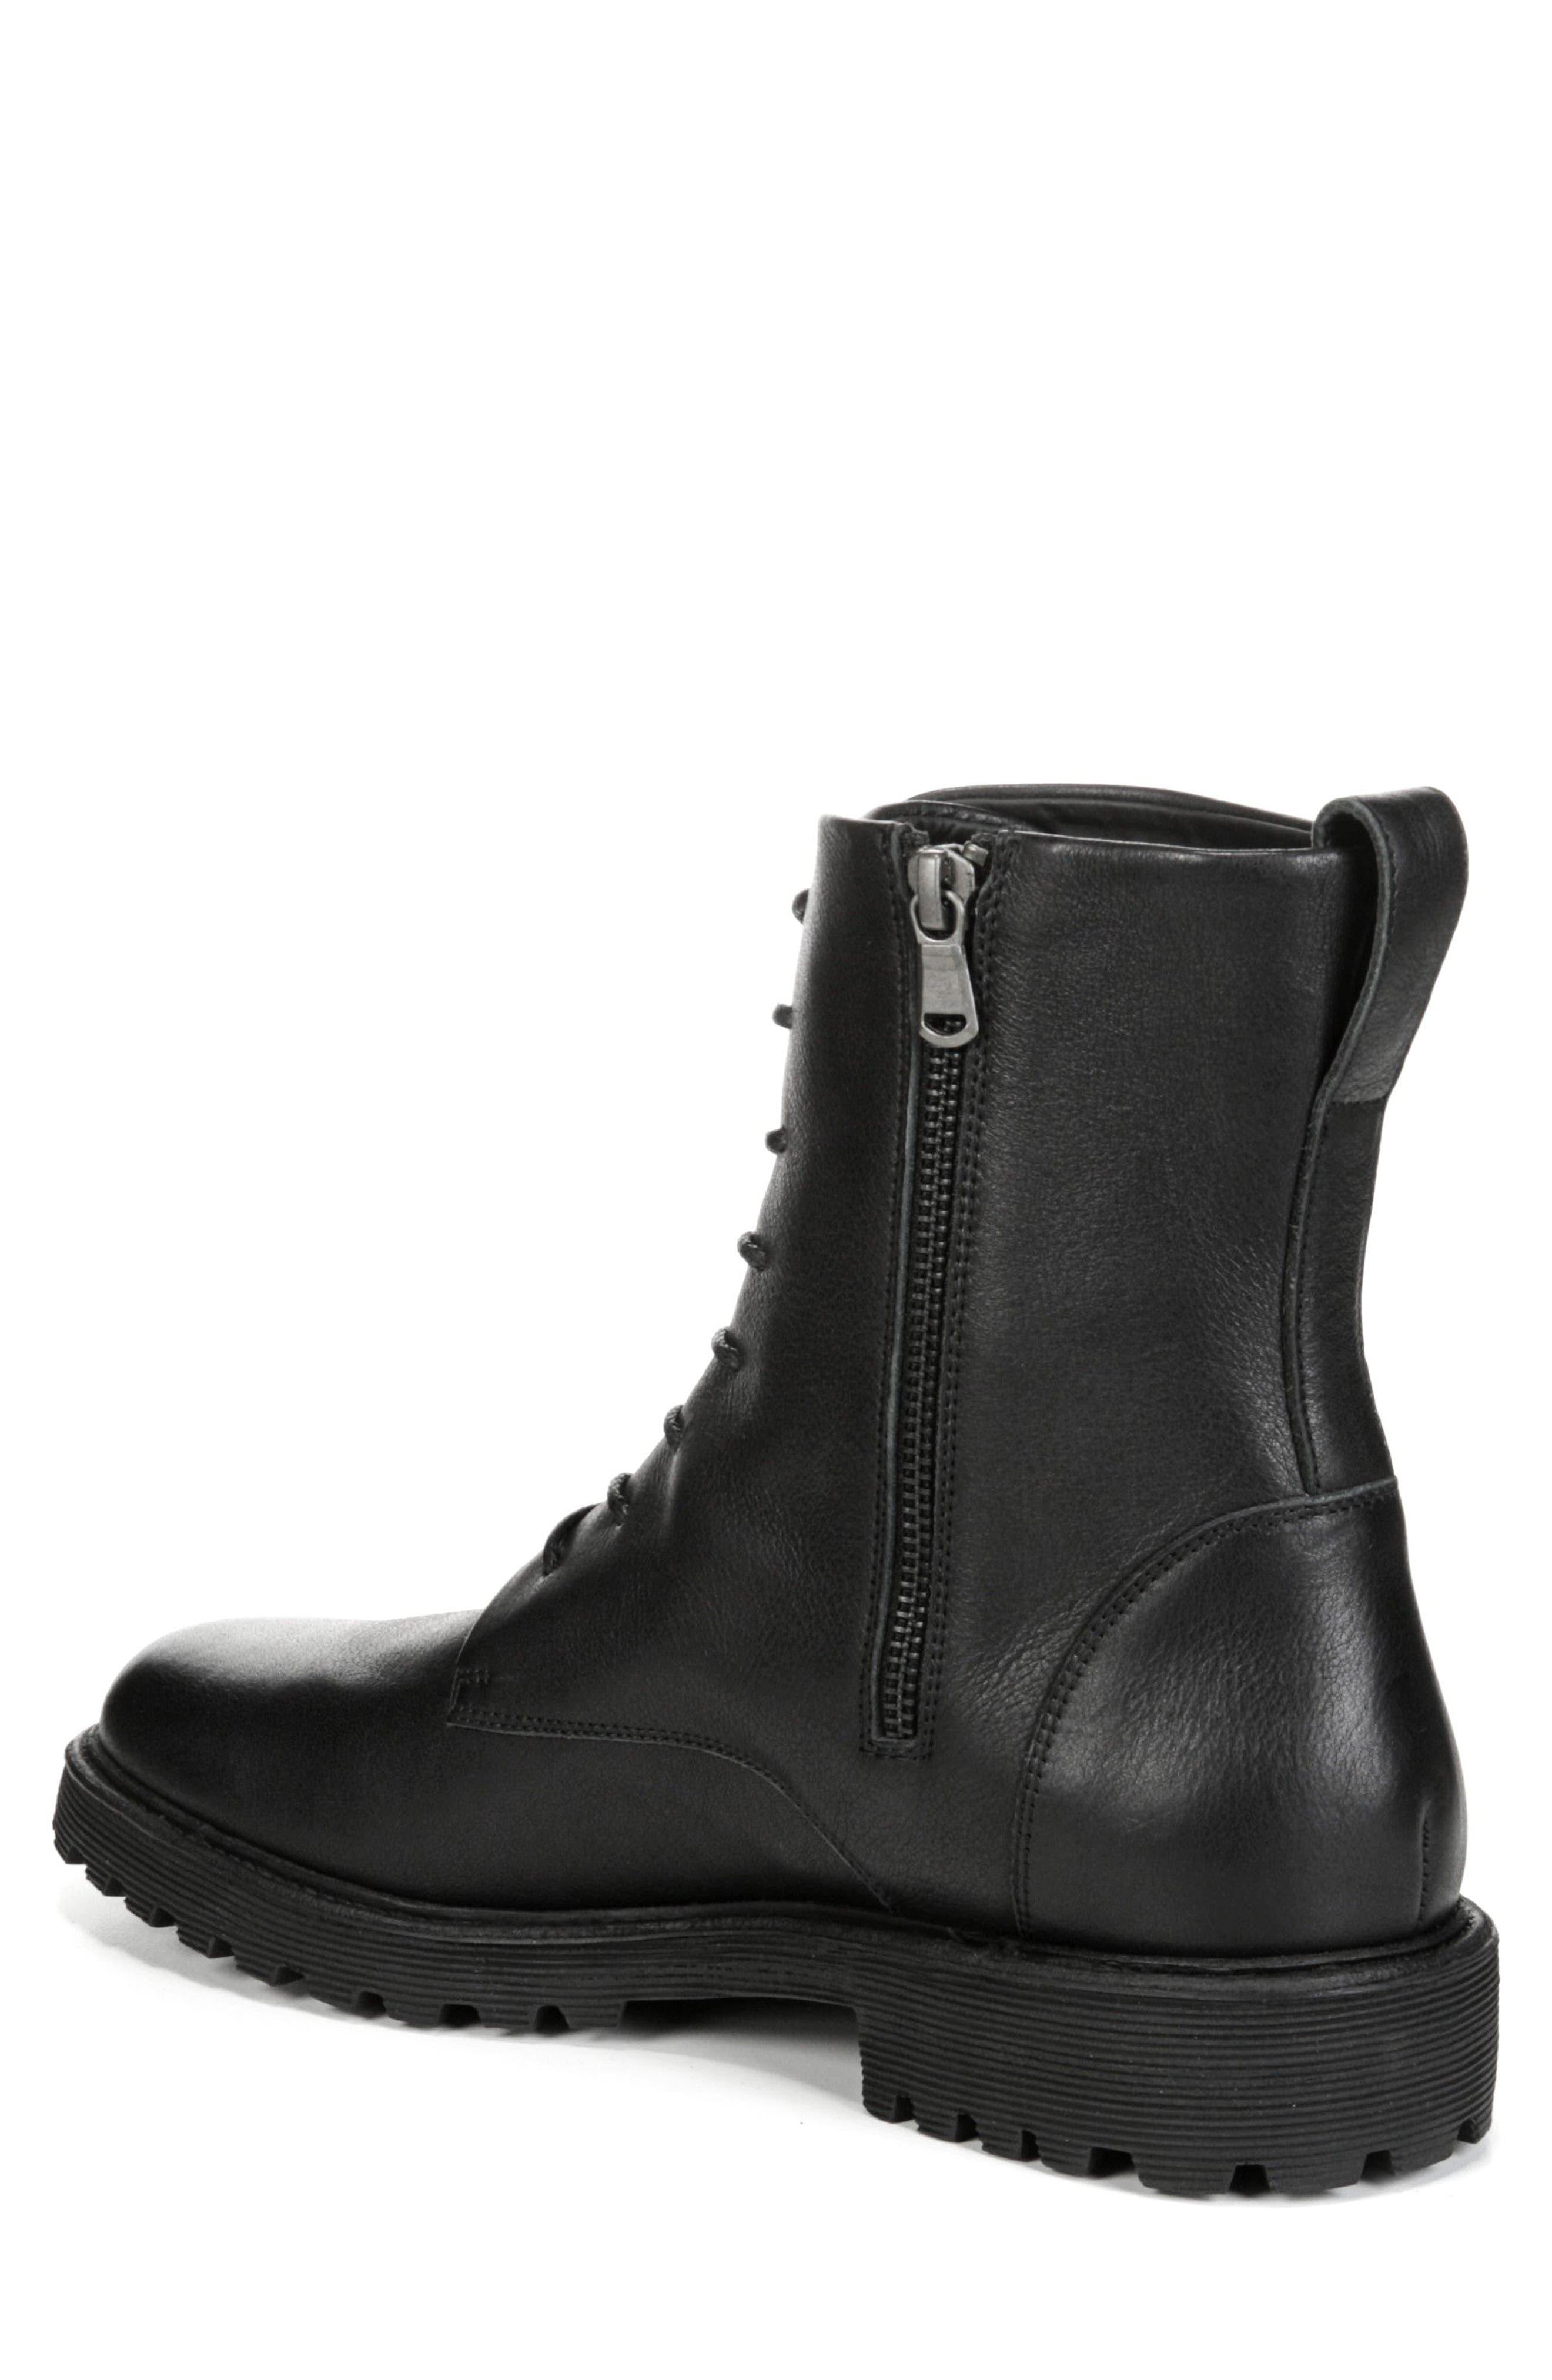 Brigade Plain Toe Boot,                             Alternate thumbnail 2, color,                             001